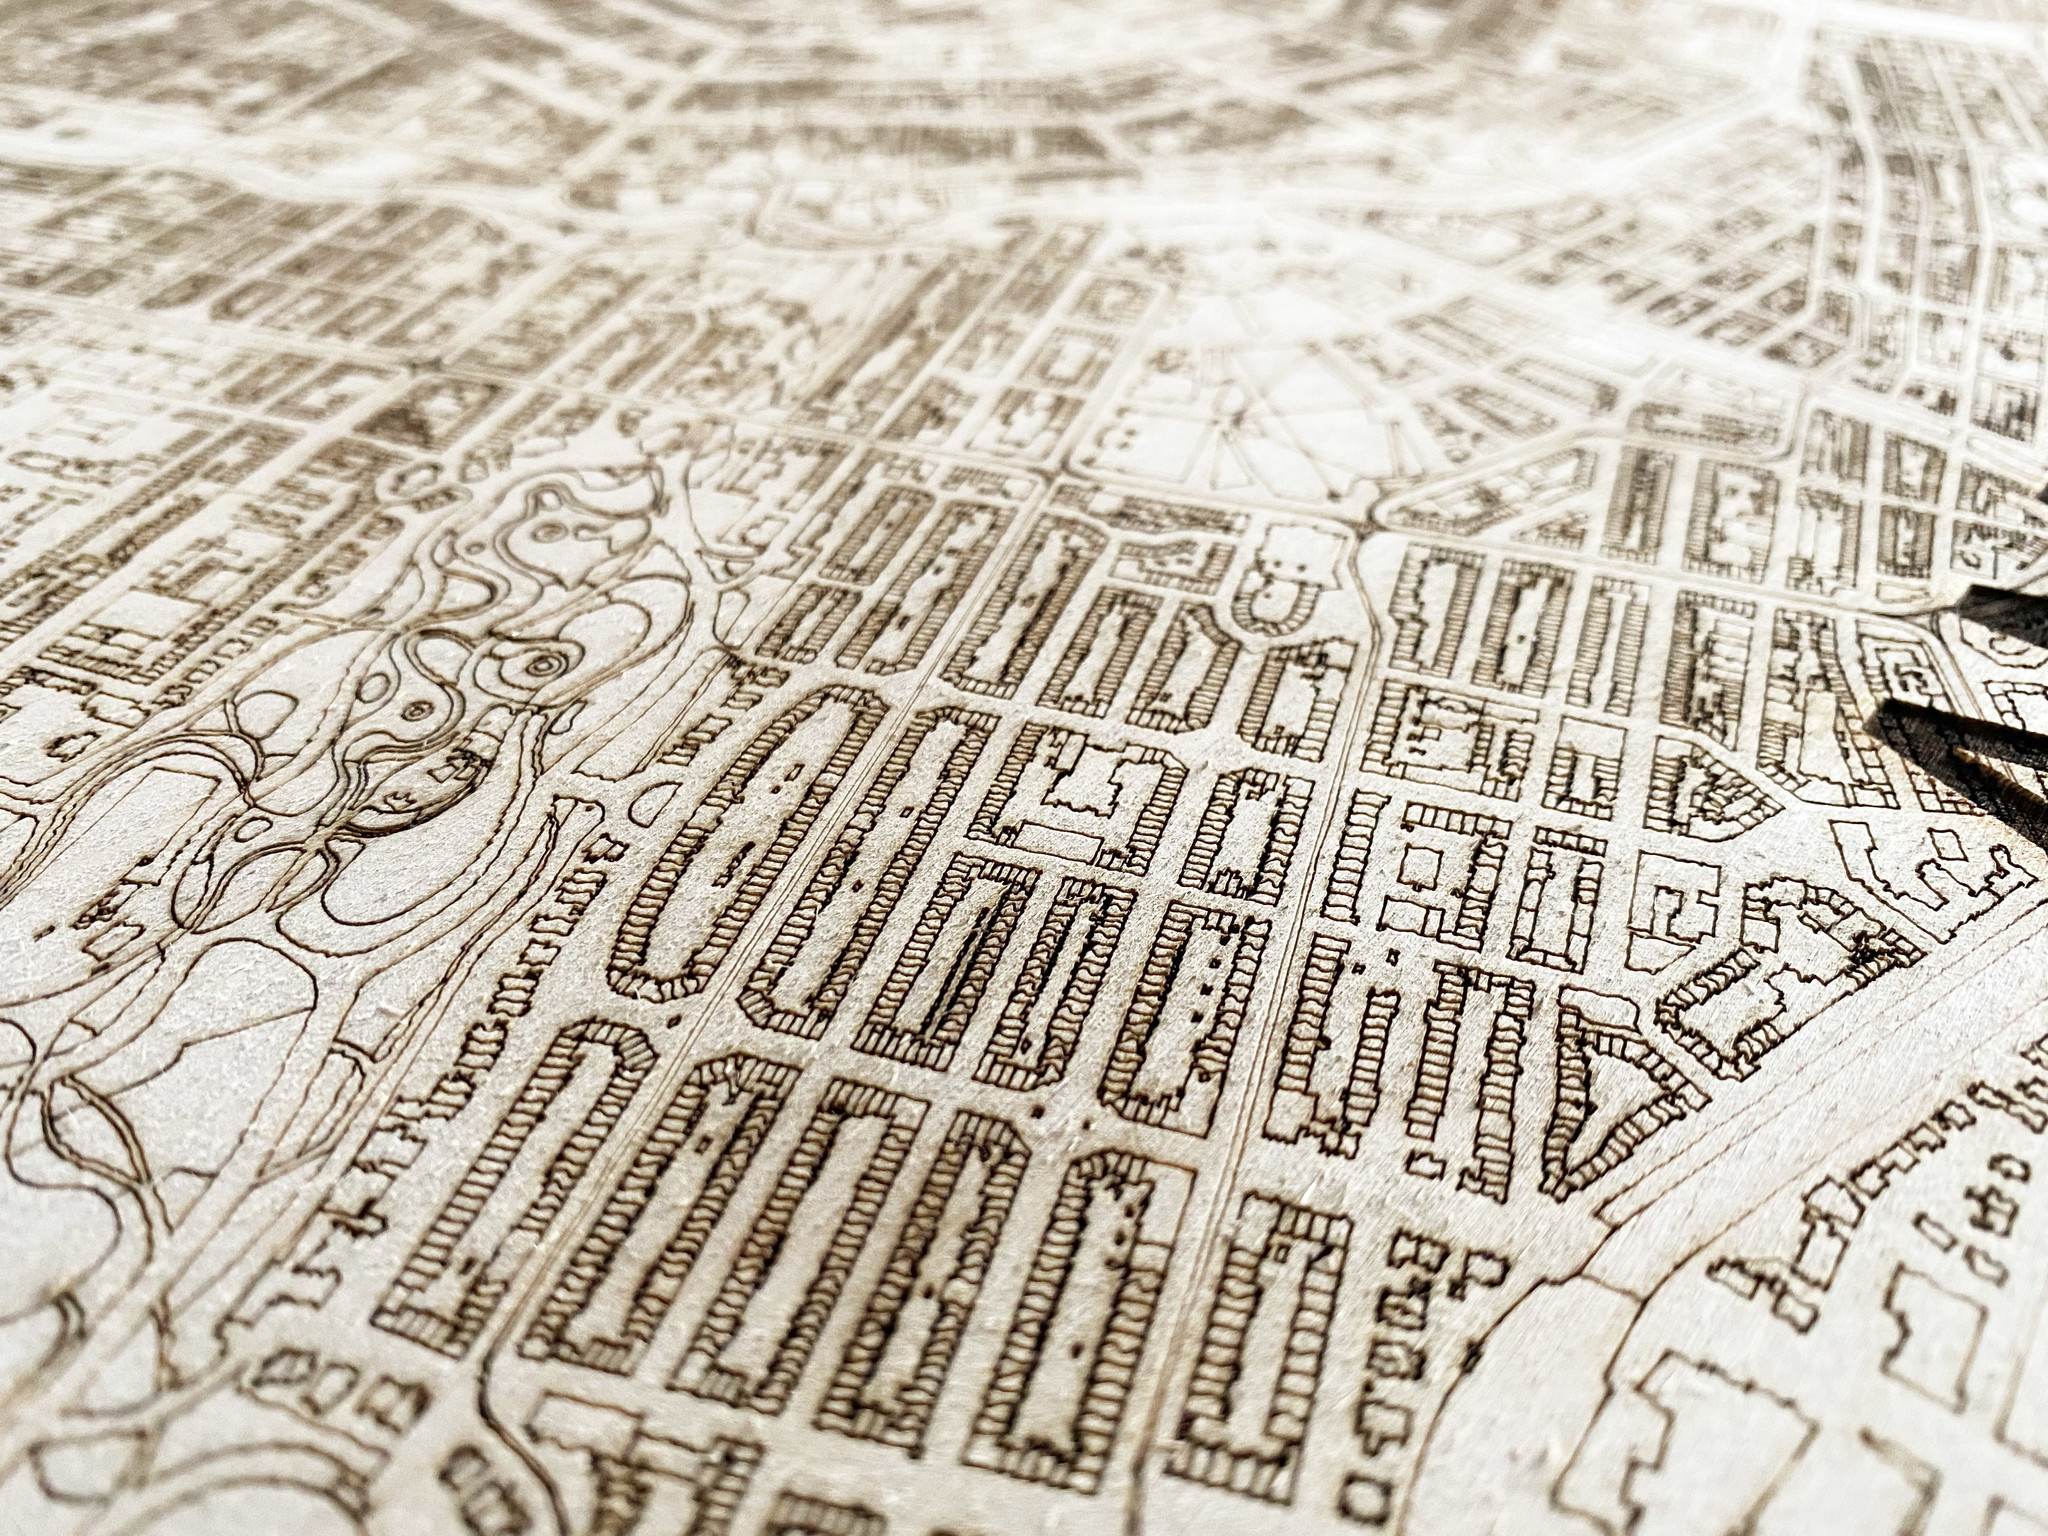 Houten stadsplattegrond Sneek-3